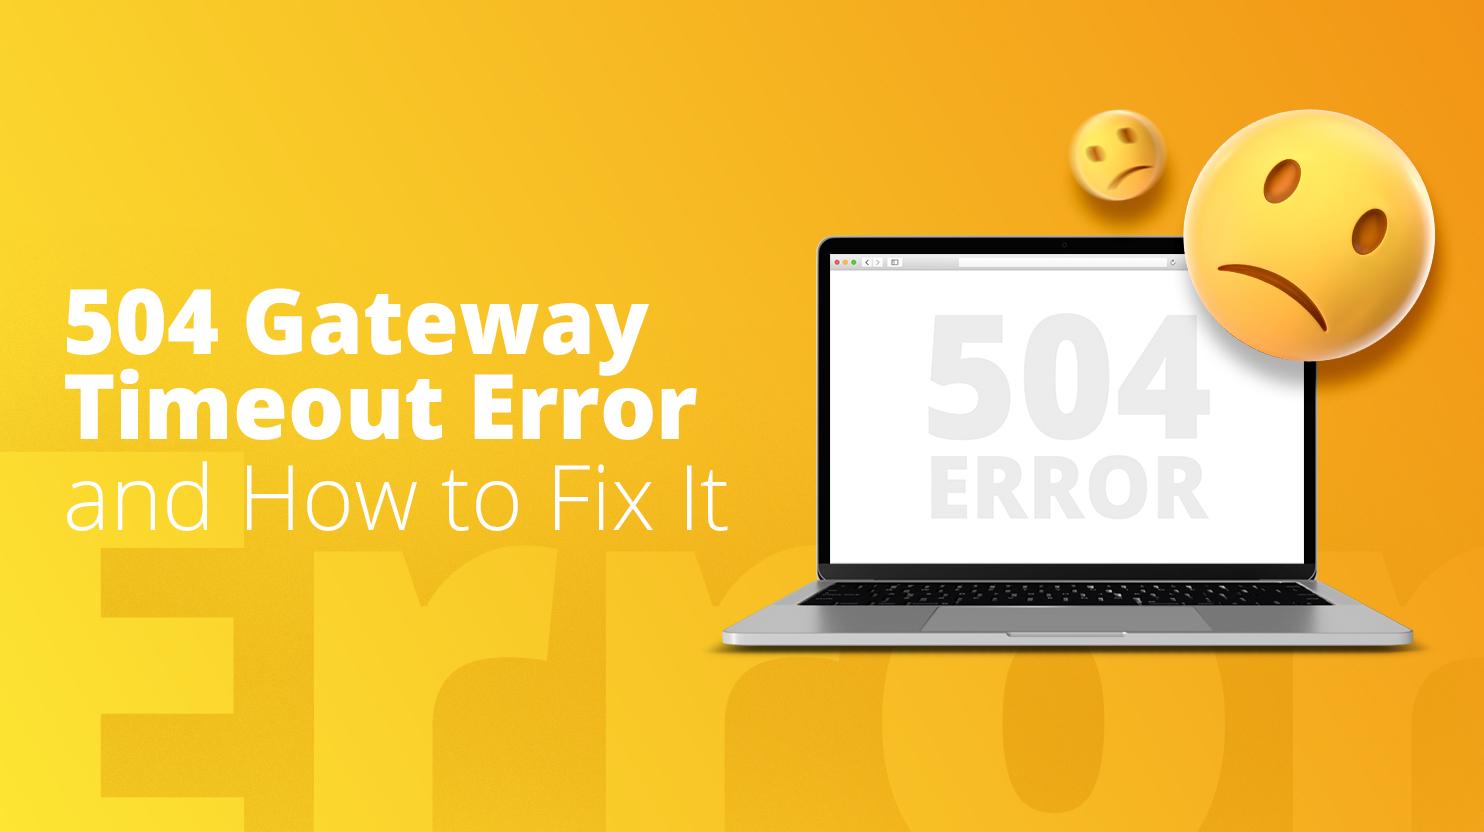 Fix the 504 Gateway Timeout Error